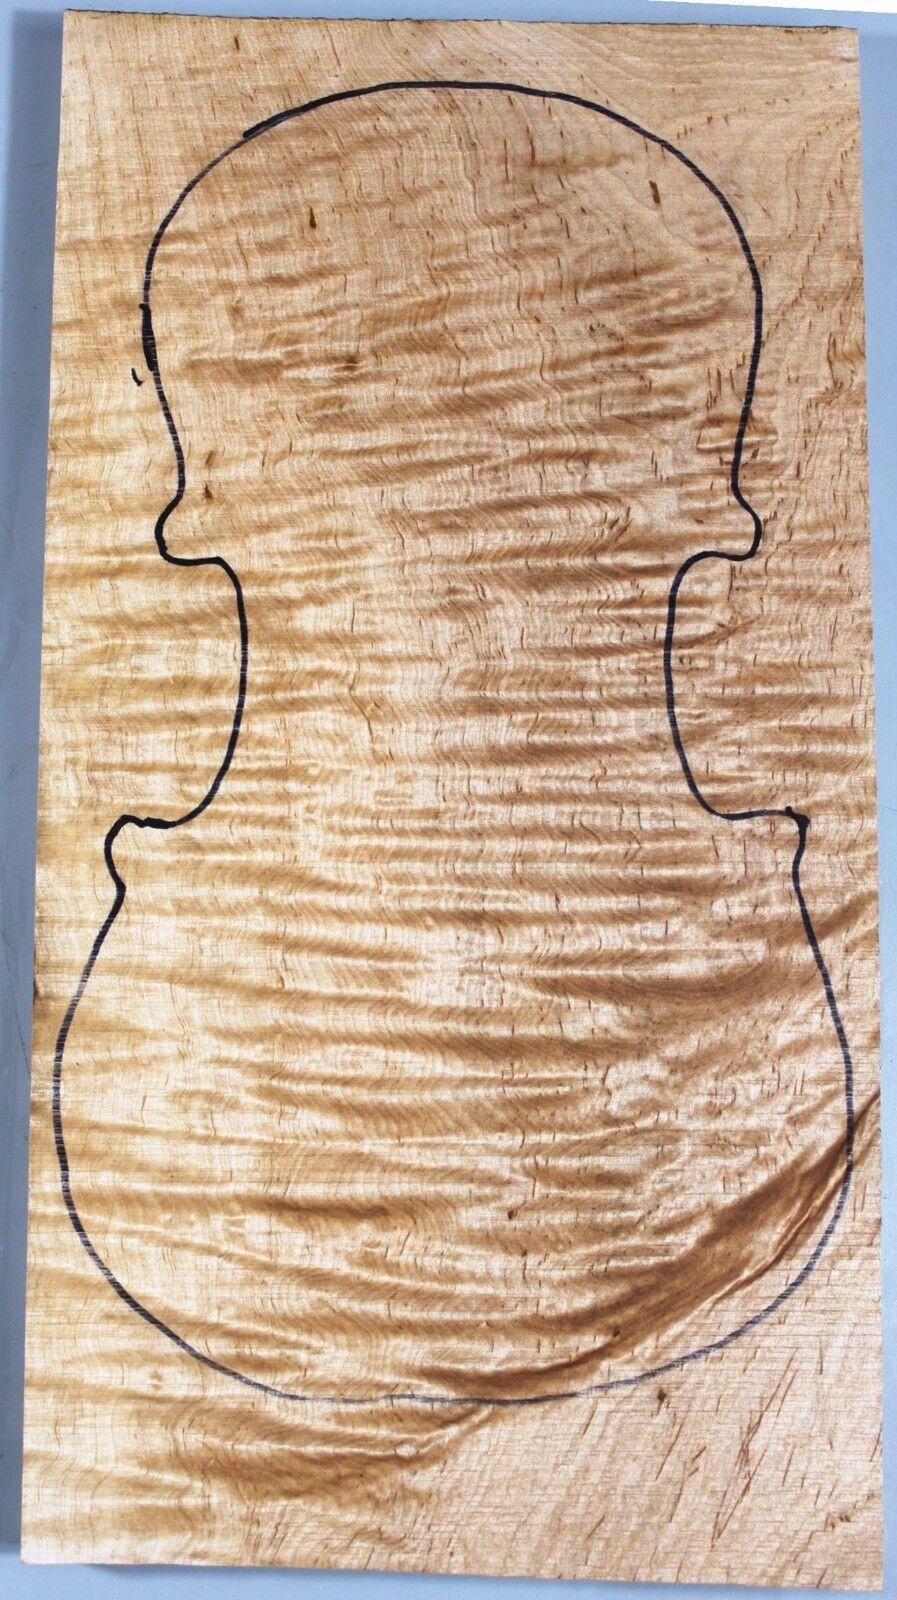 Elegant Ripple Maple 4 4 Violin Top Instrument Music Supply  3516